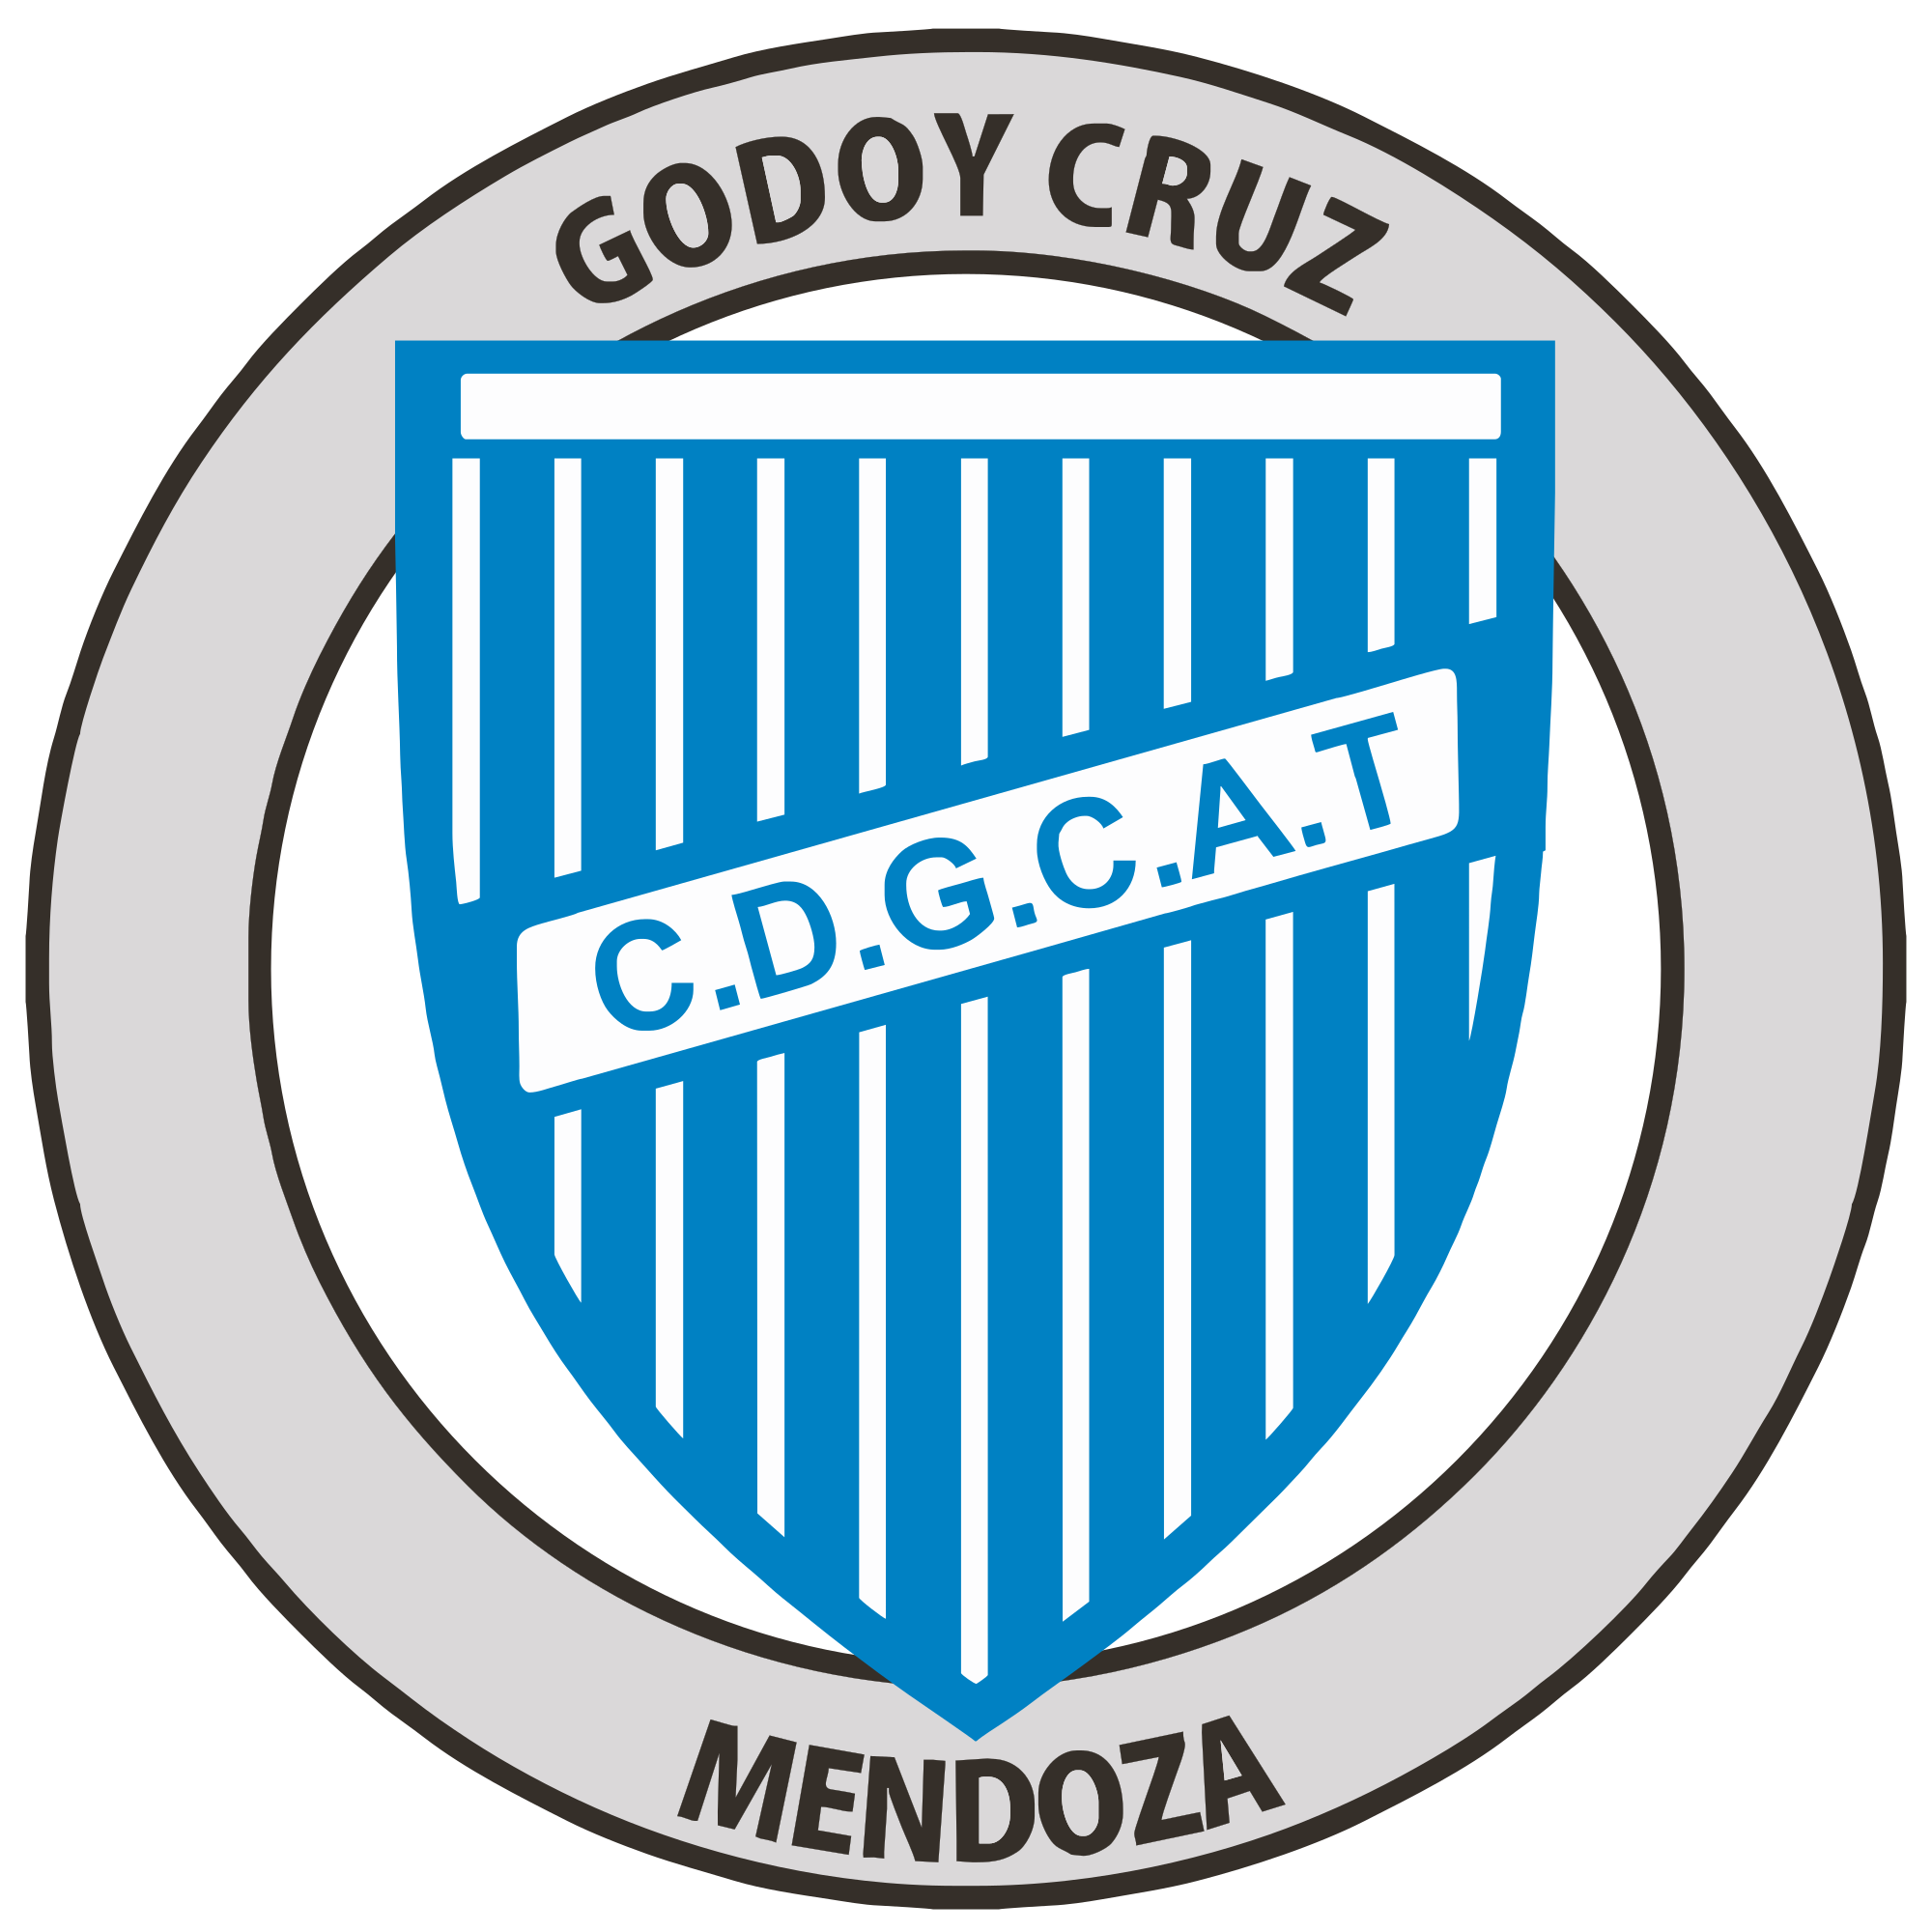 Escudo Del Club Godoy Cruz De Mendoza Png